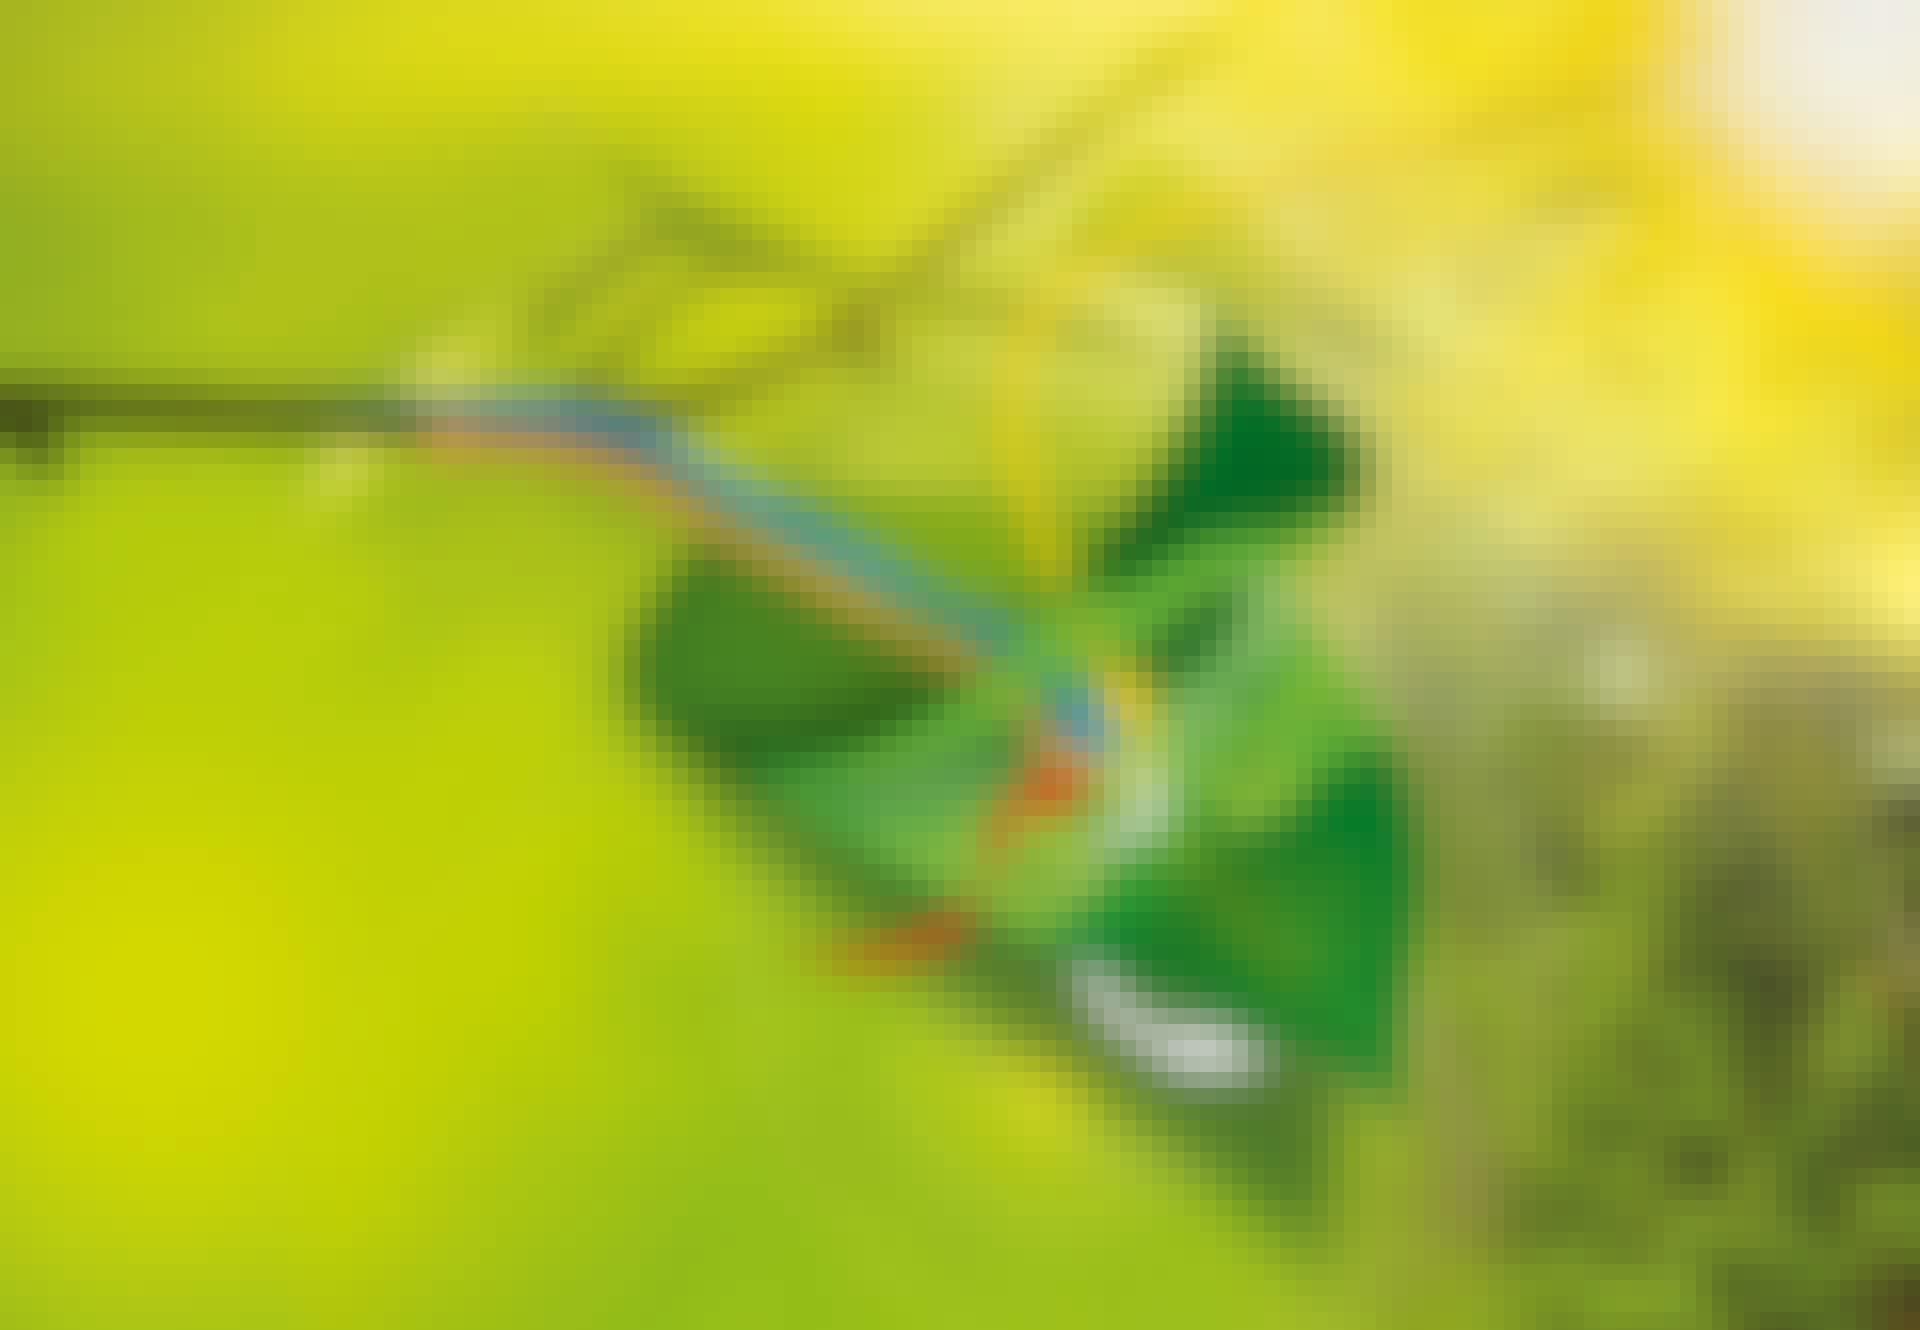 Sådan virker fotosyntese